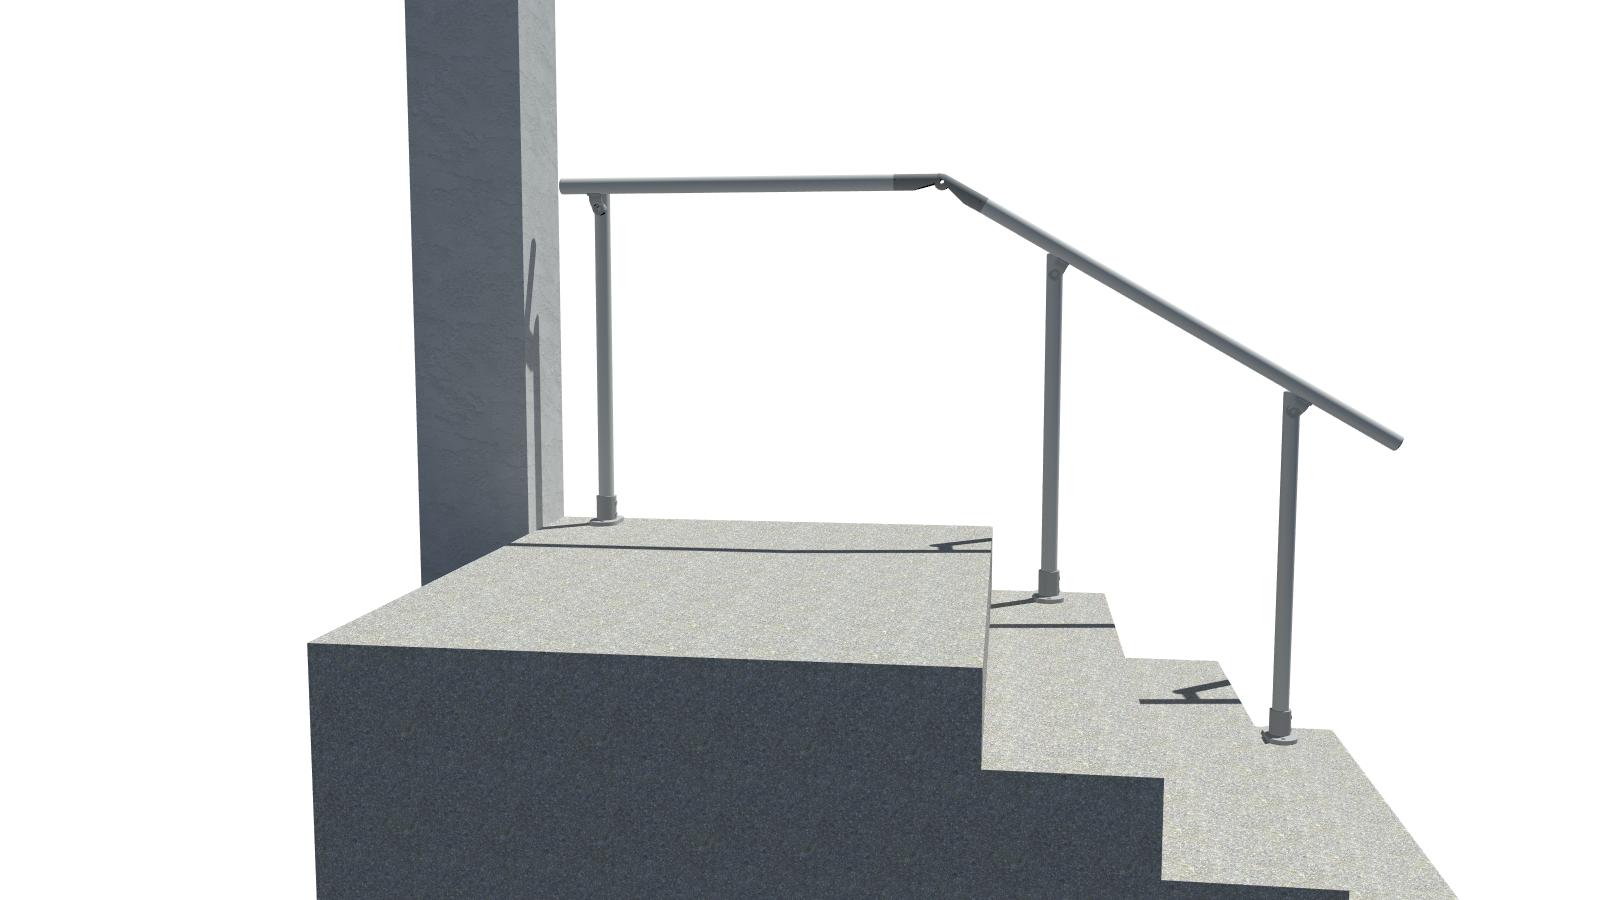 Surface Landing L160 - Surface Mount Railing | Simplified ...